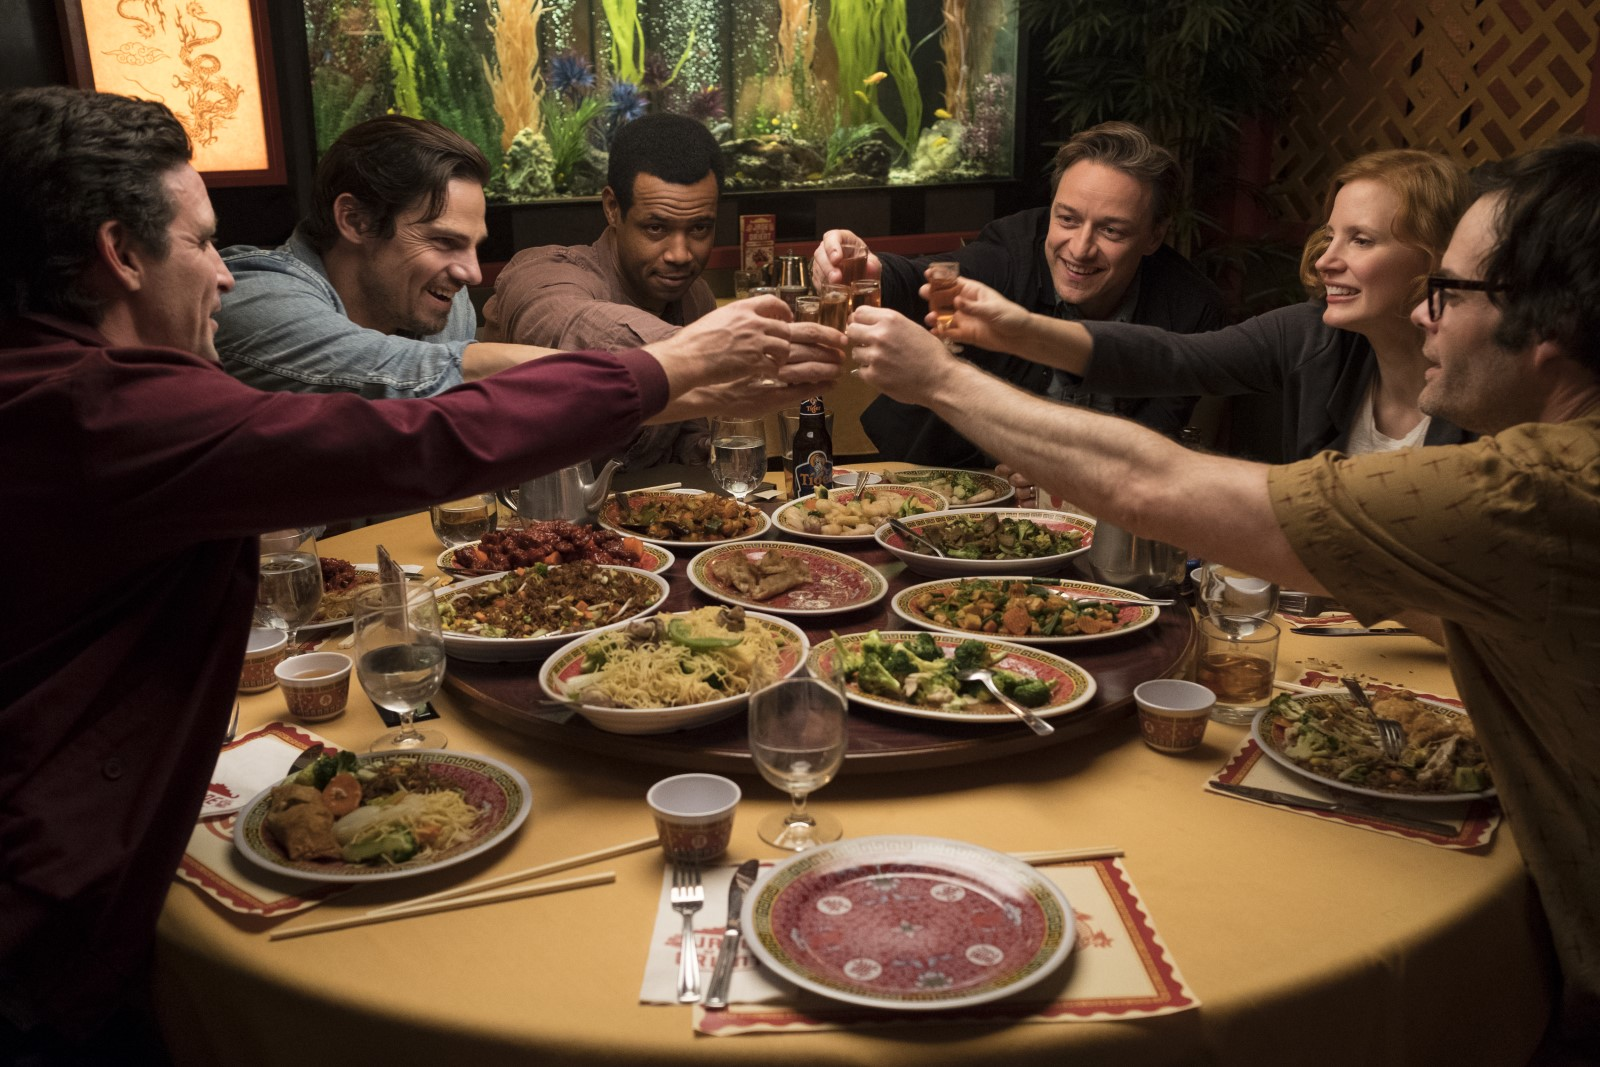 Ça - Chapitre 2 - Photo Bill Hader, Isaiah Mustafa, James McAvoy, James Ransone, Jay Ryan critique avis film